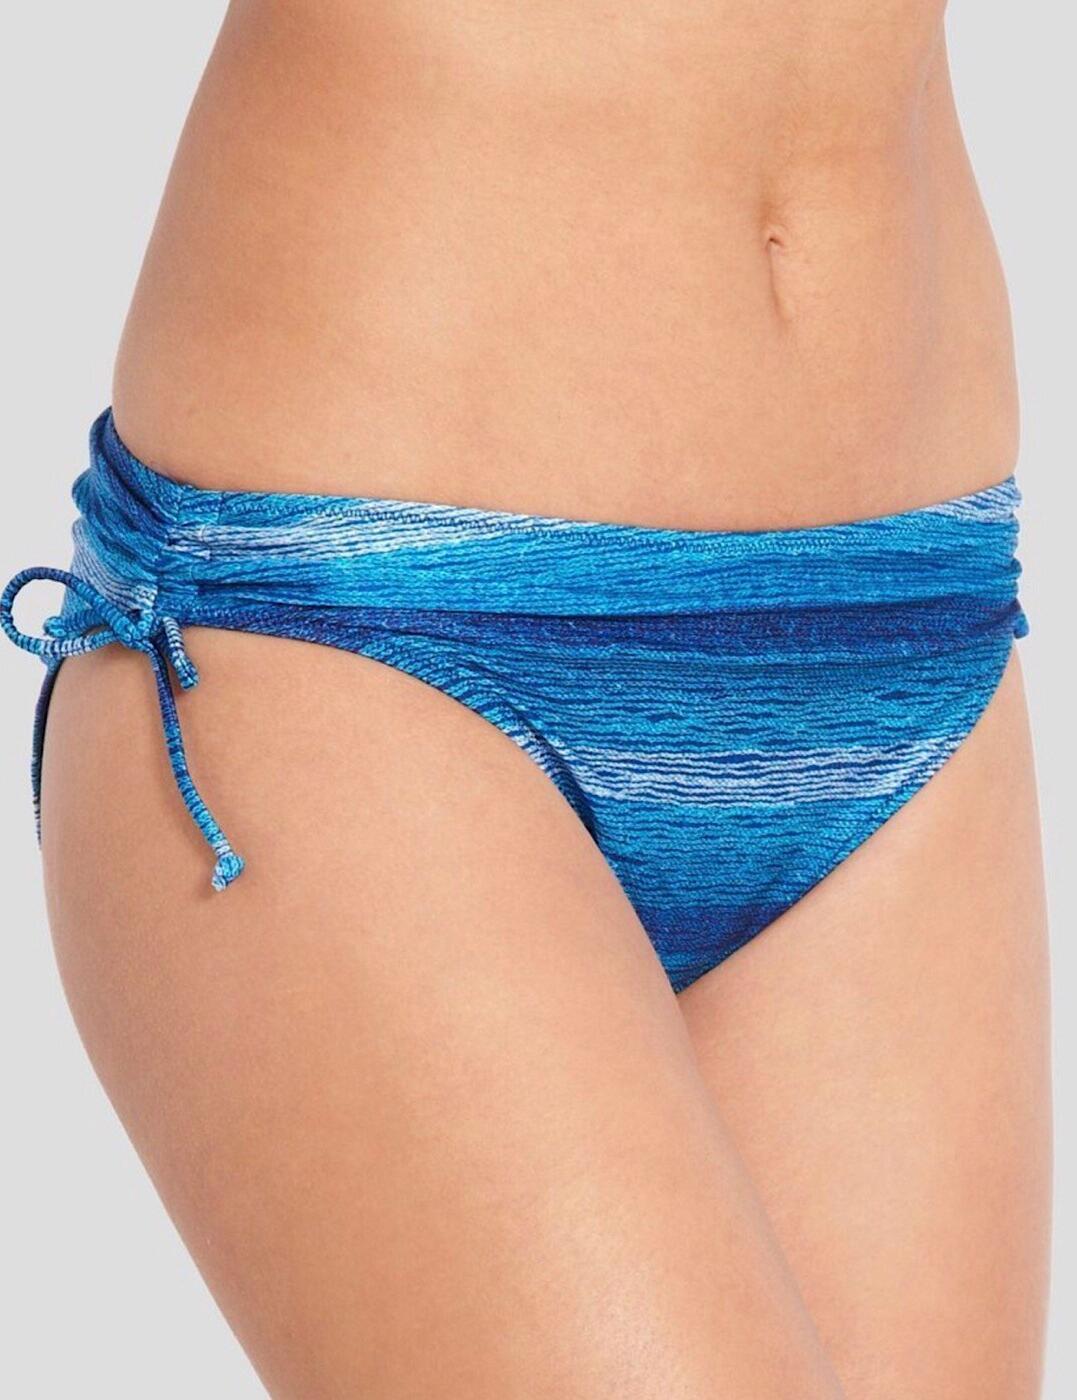 Fantasie Grenada Bikini Brief in Bluebird